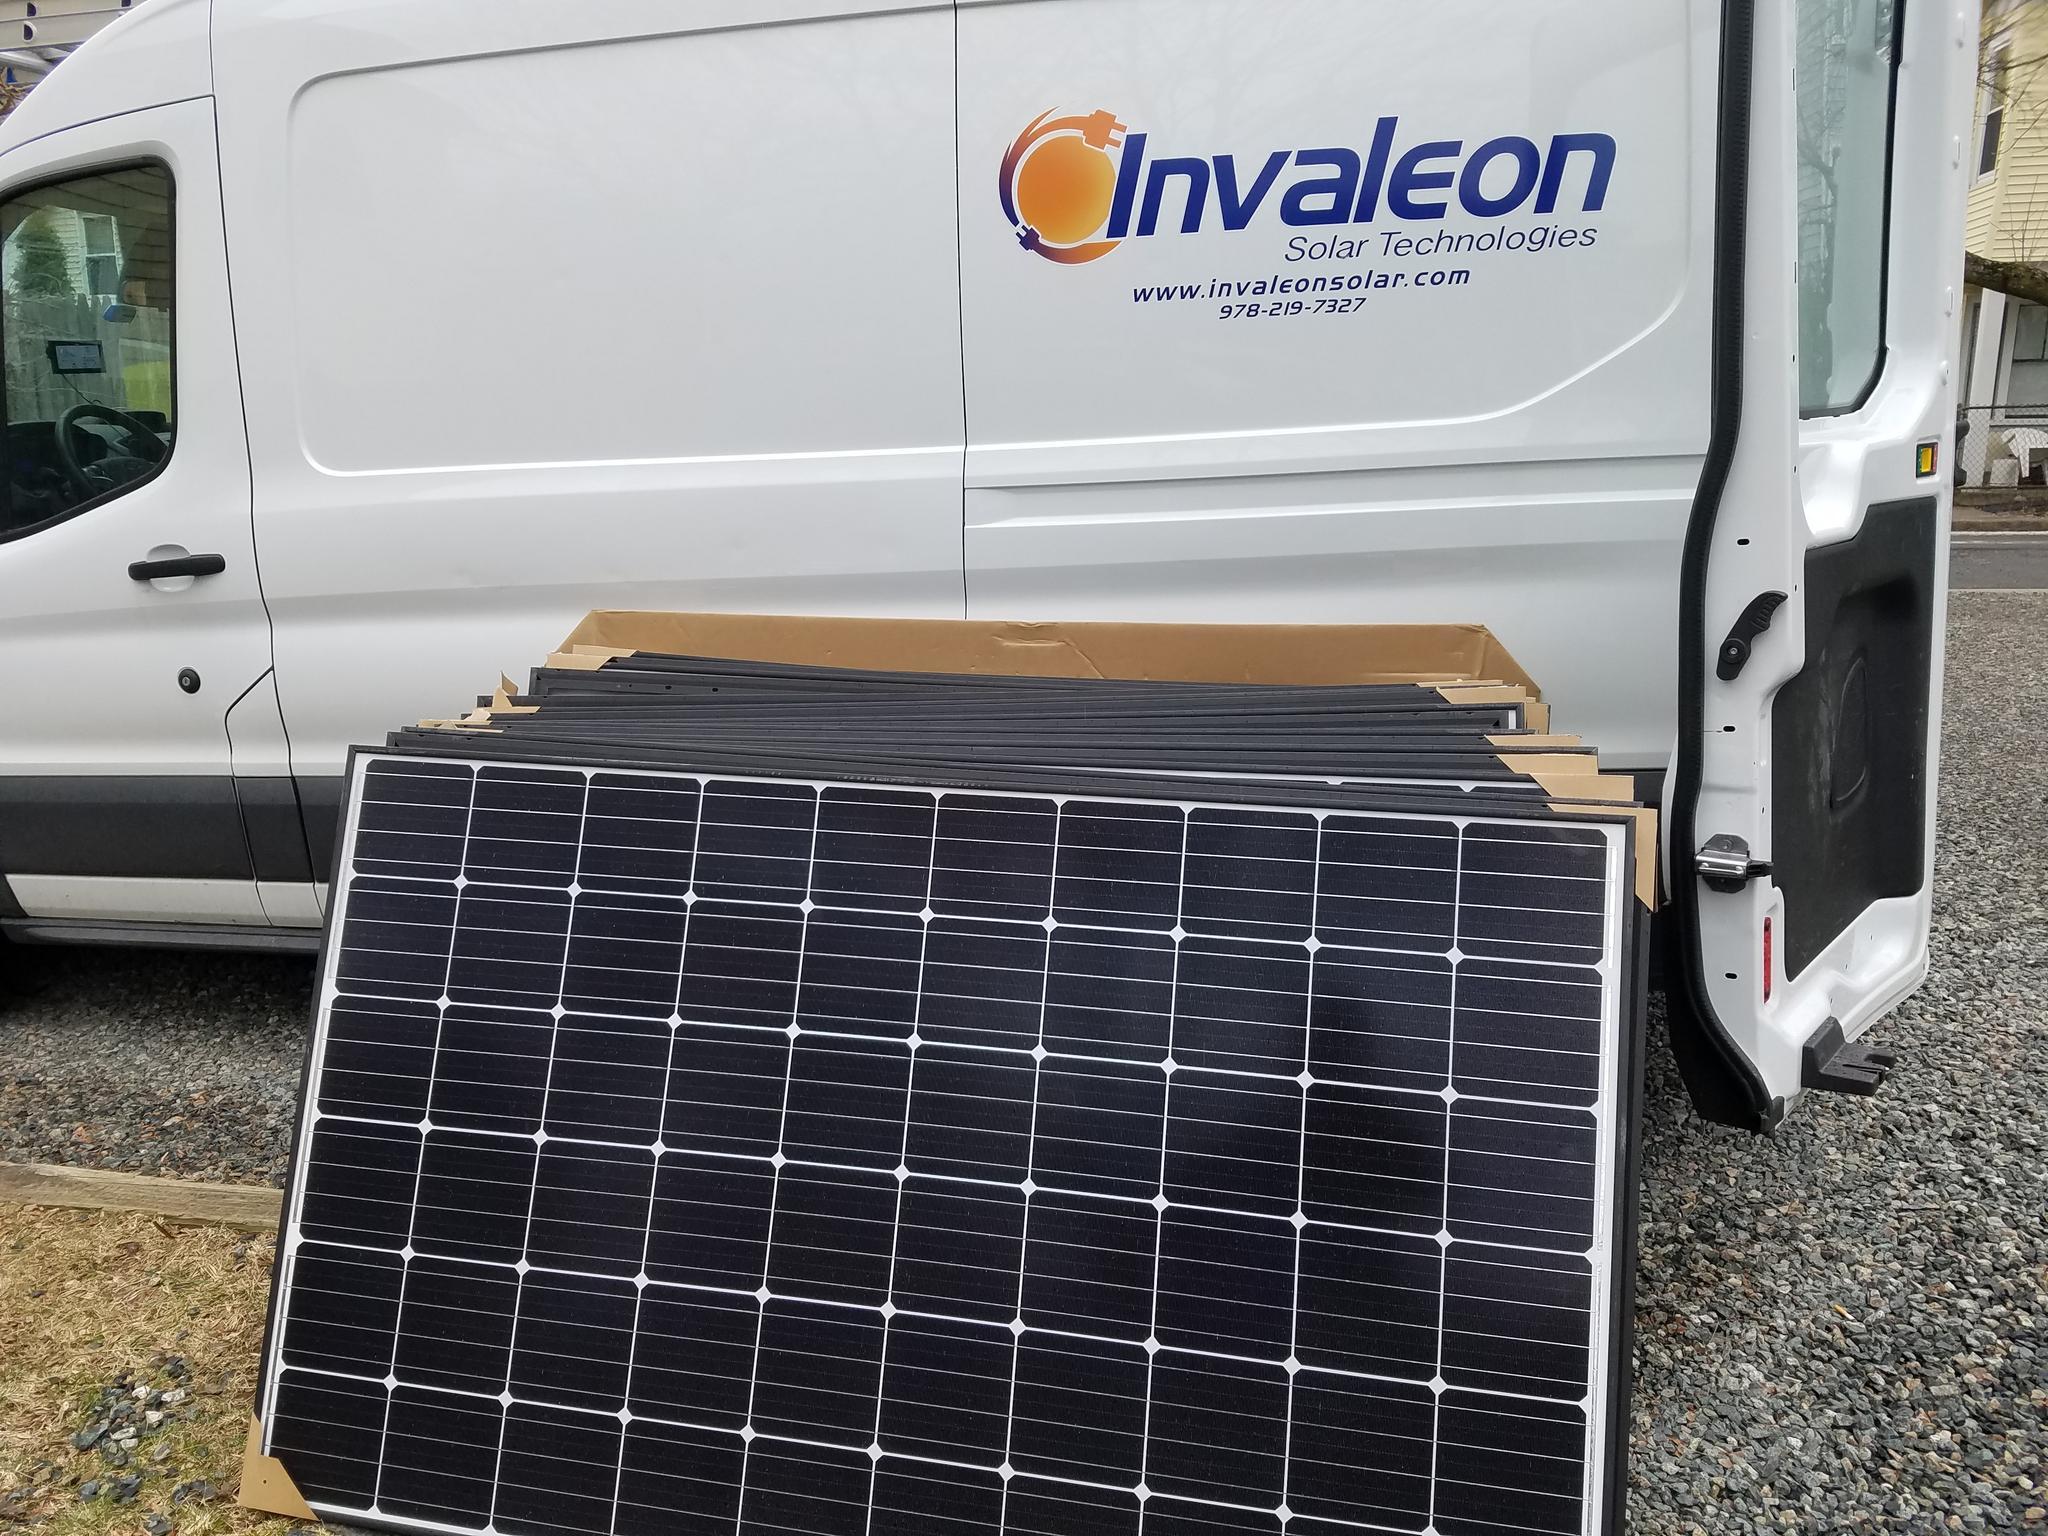 Cambridge Solar Pv Energysage